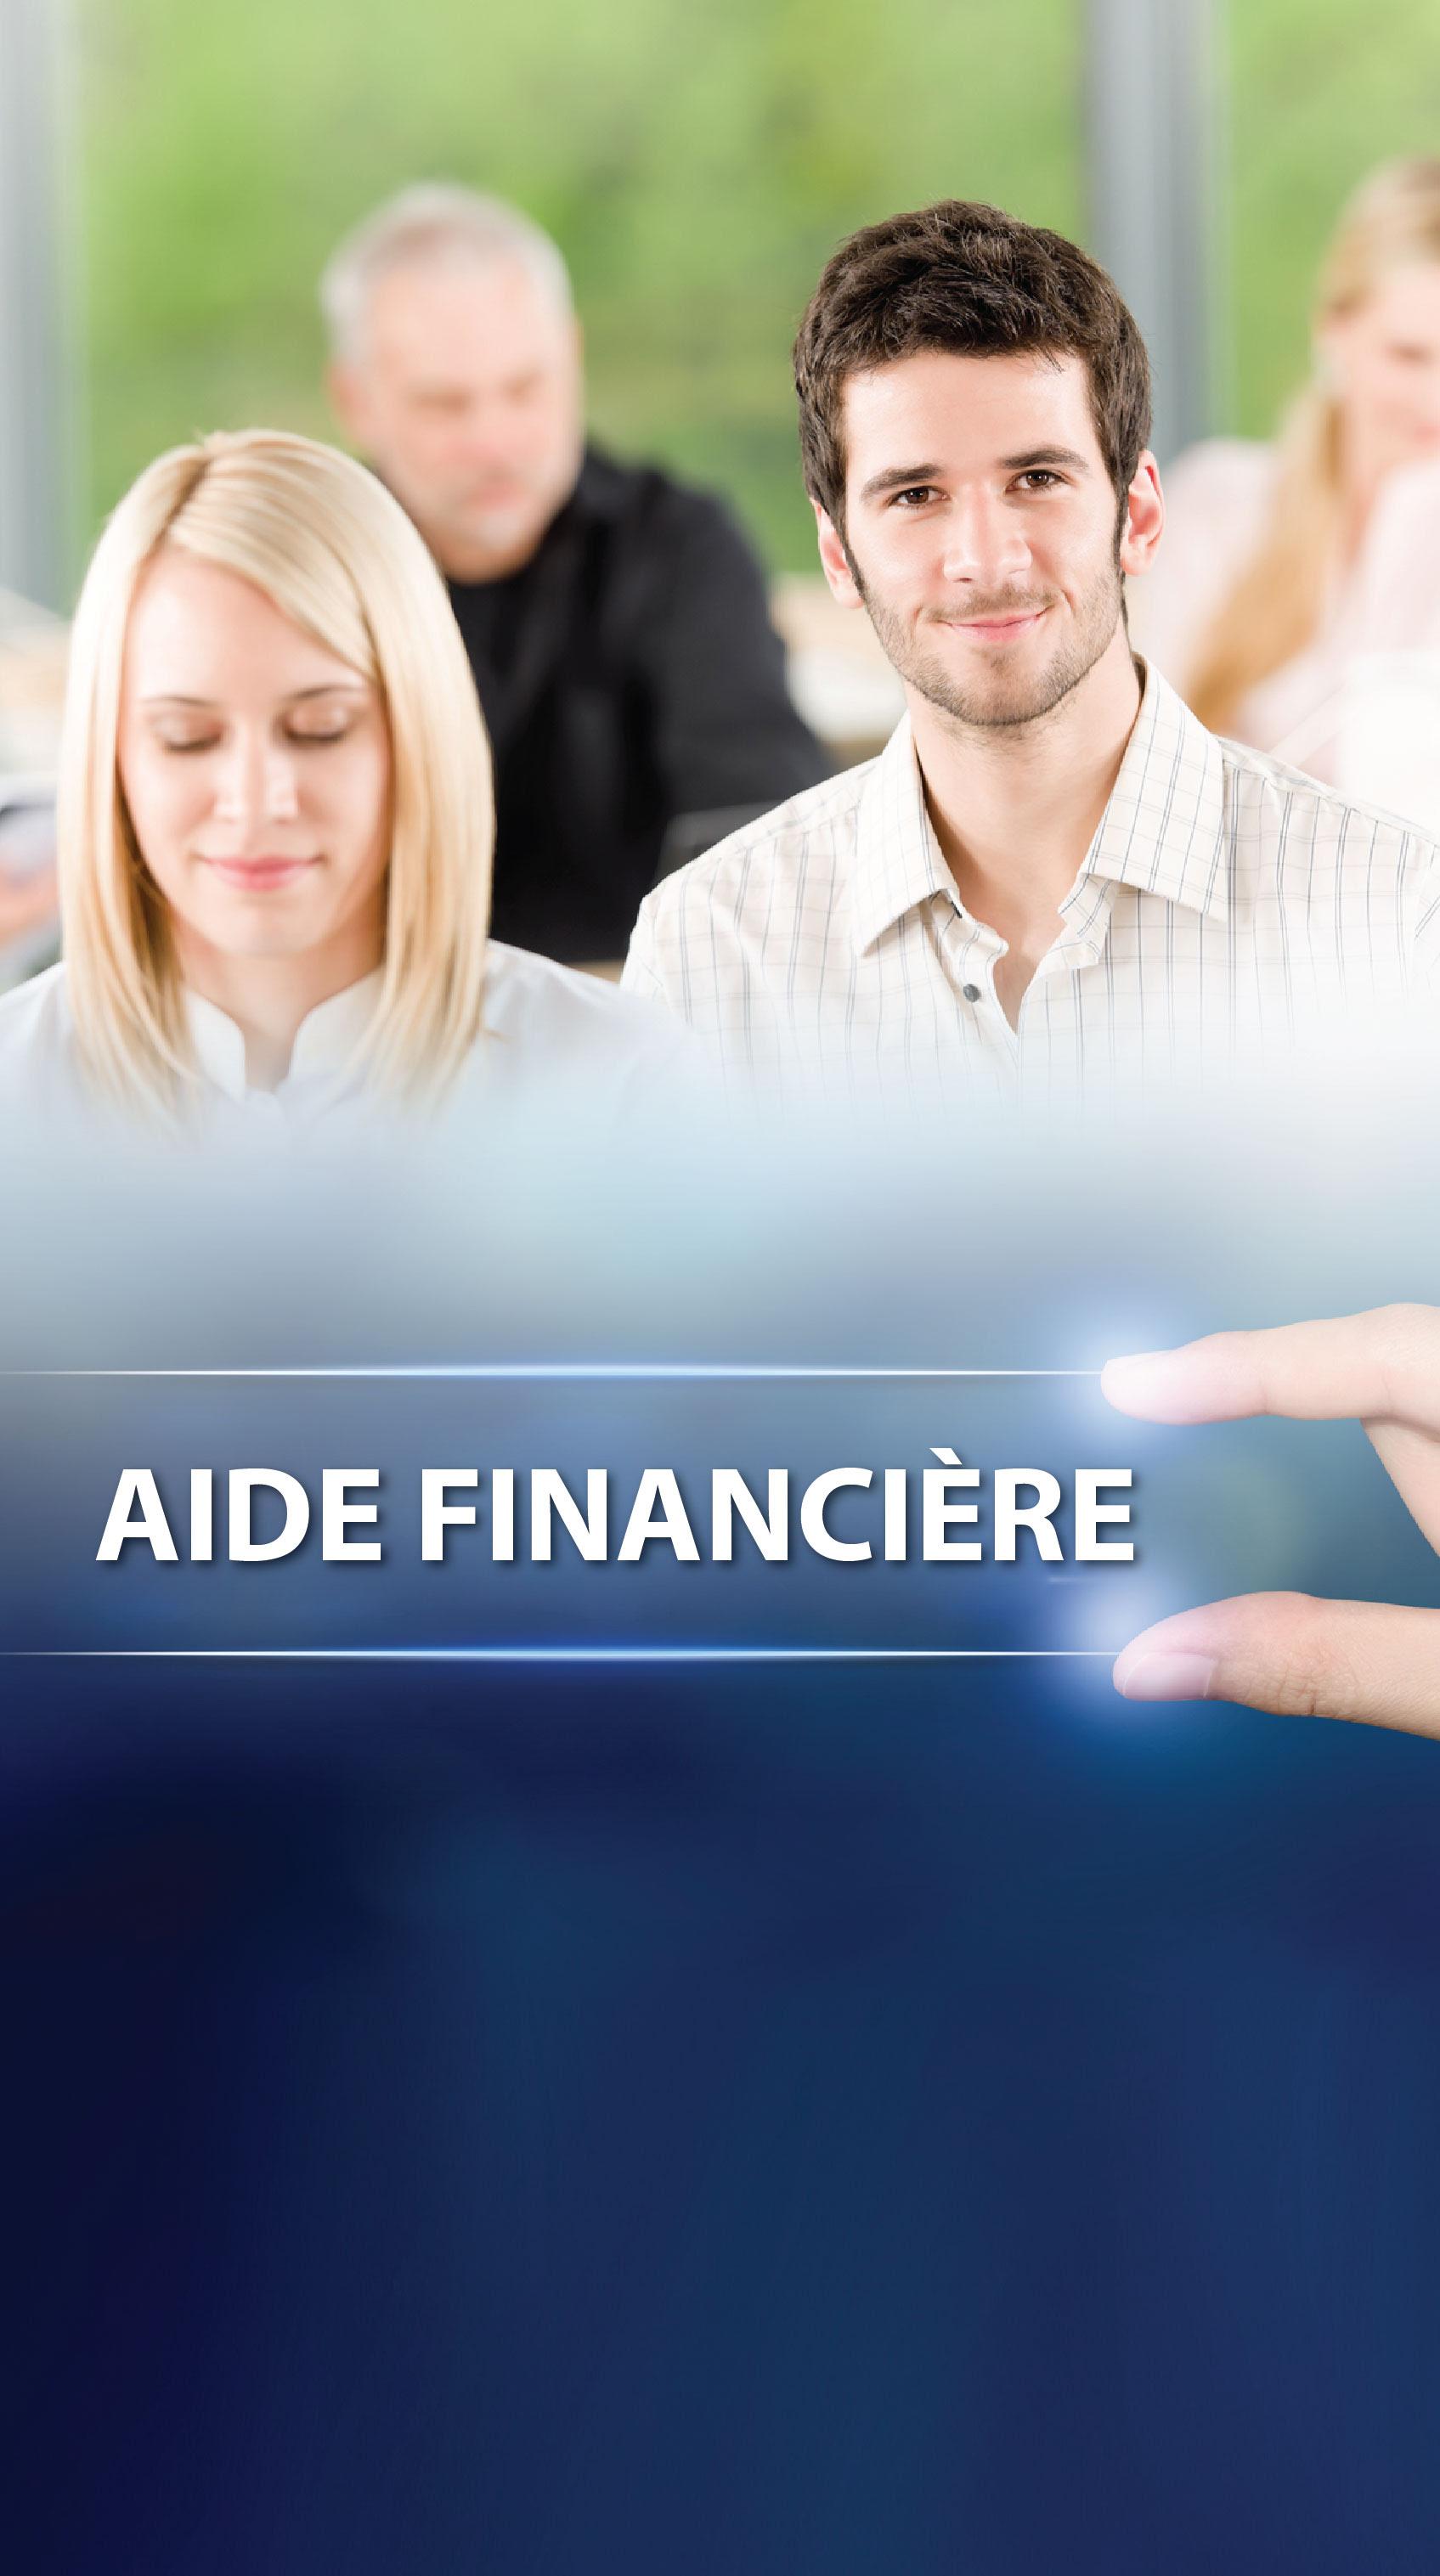 CN_Finance_03042017.jpg